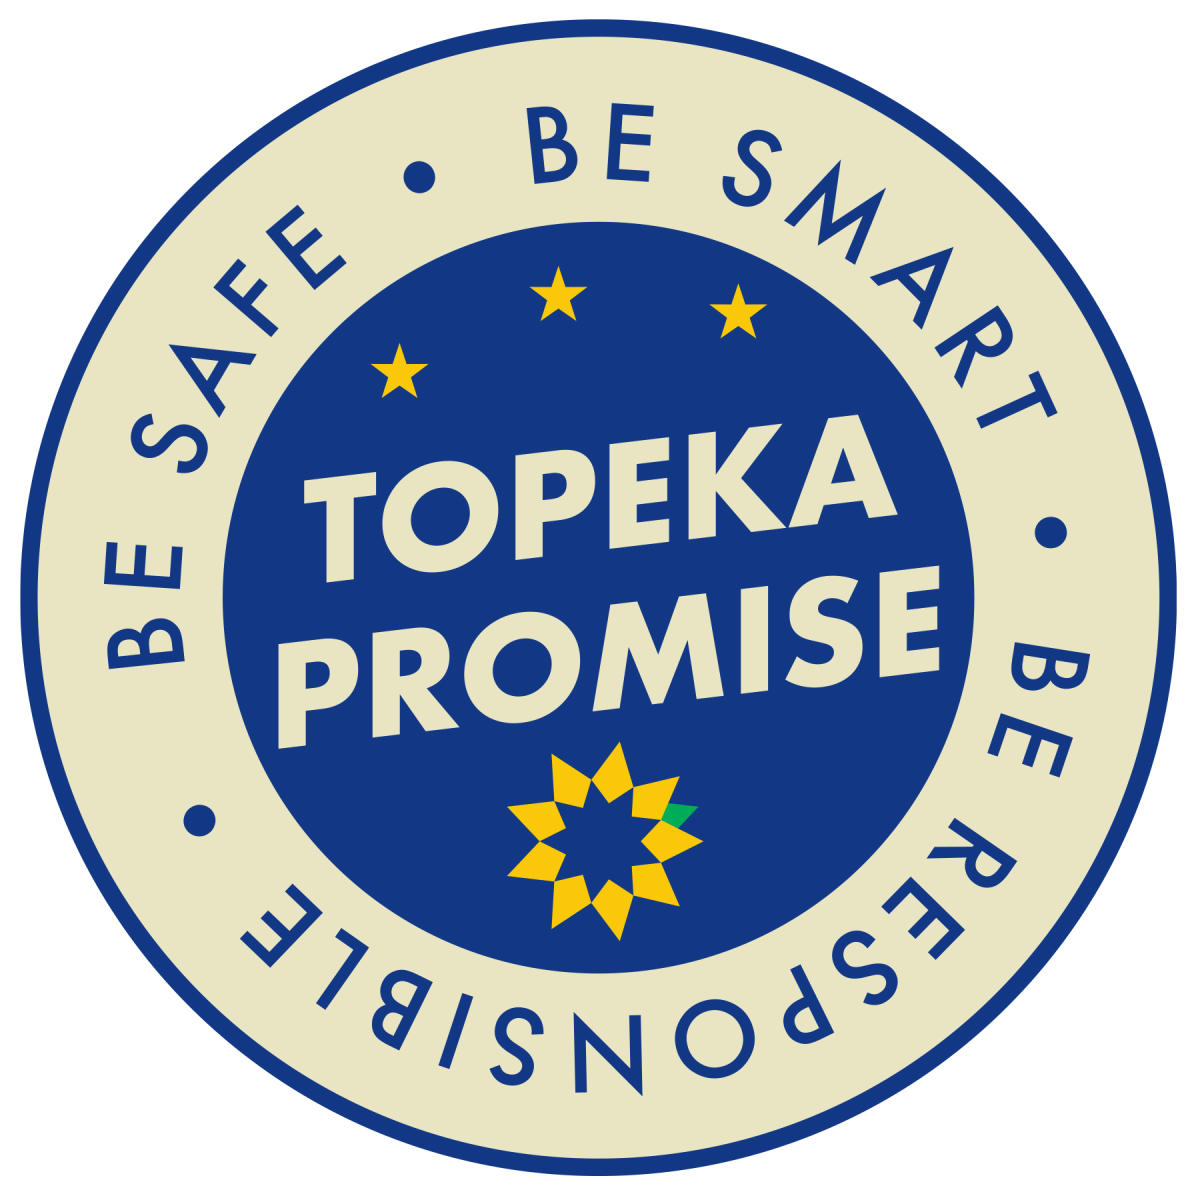 topeka promise